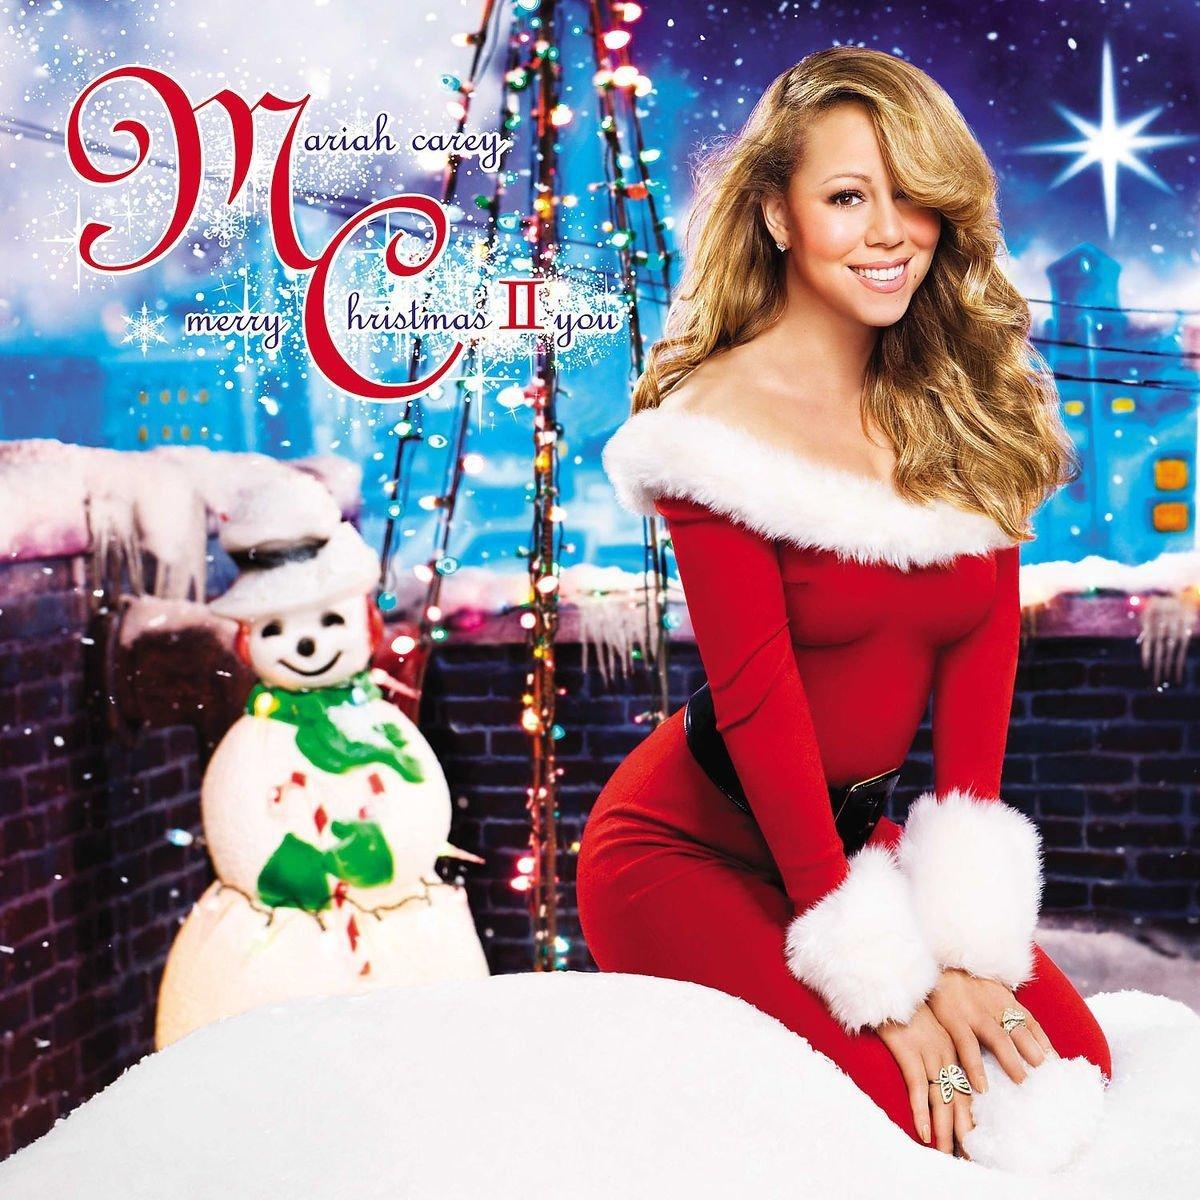 Mariah Carey - Merry Christmas II You [LP] - Amazon.com Music